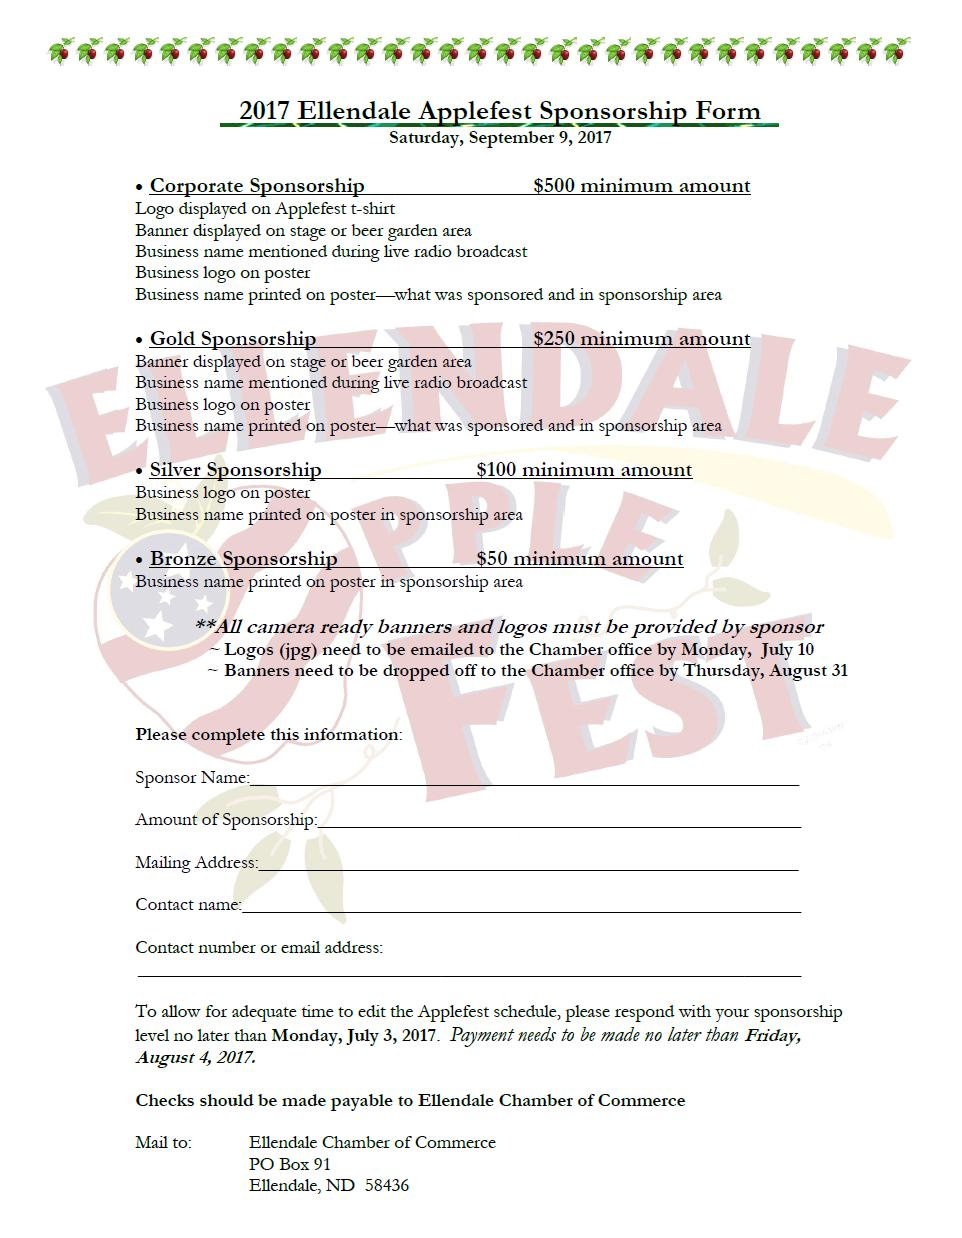 2017 Applefest form